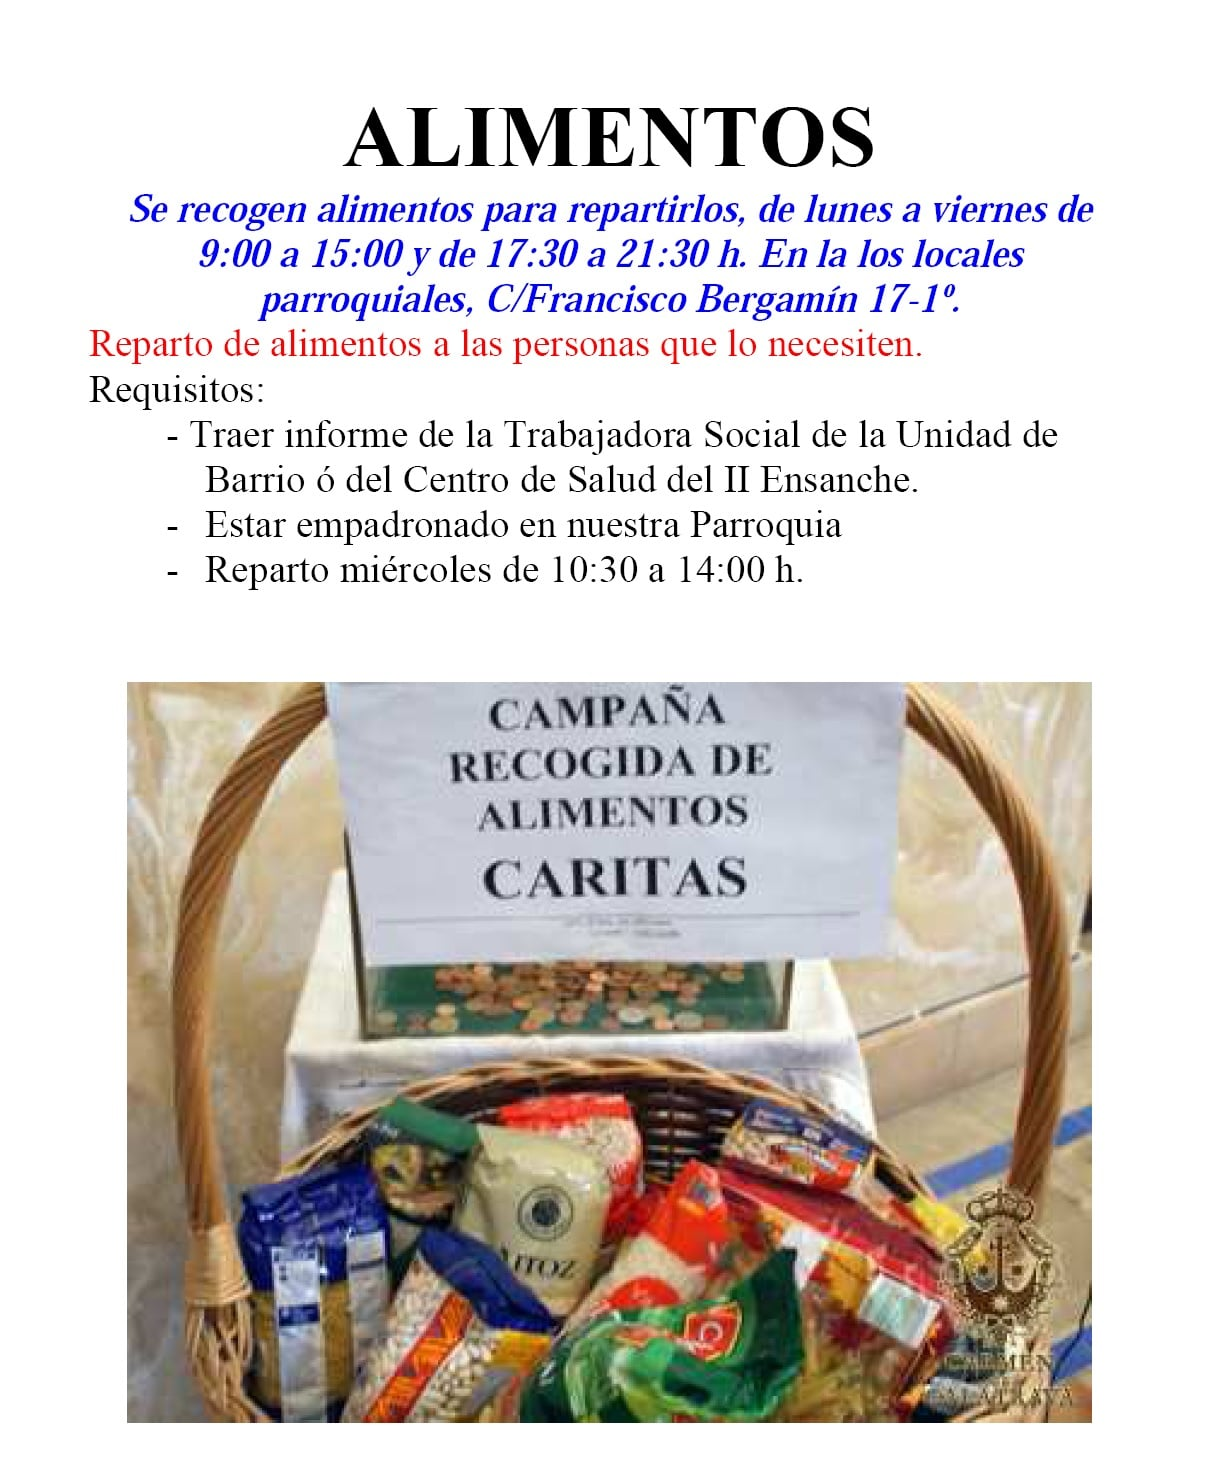 Salario Diario Empleada Hogar 2016 Salario Diario Empleada